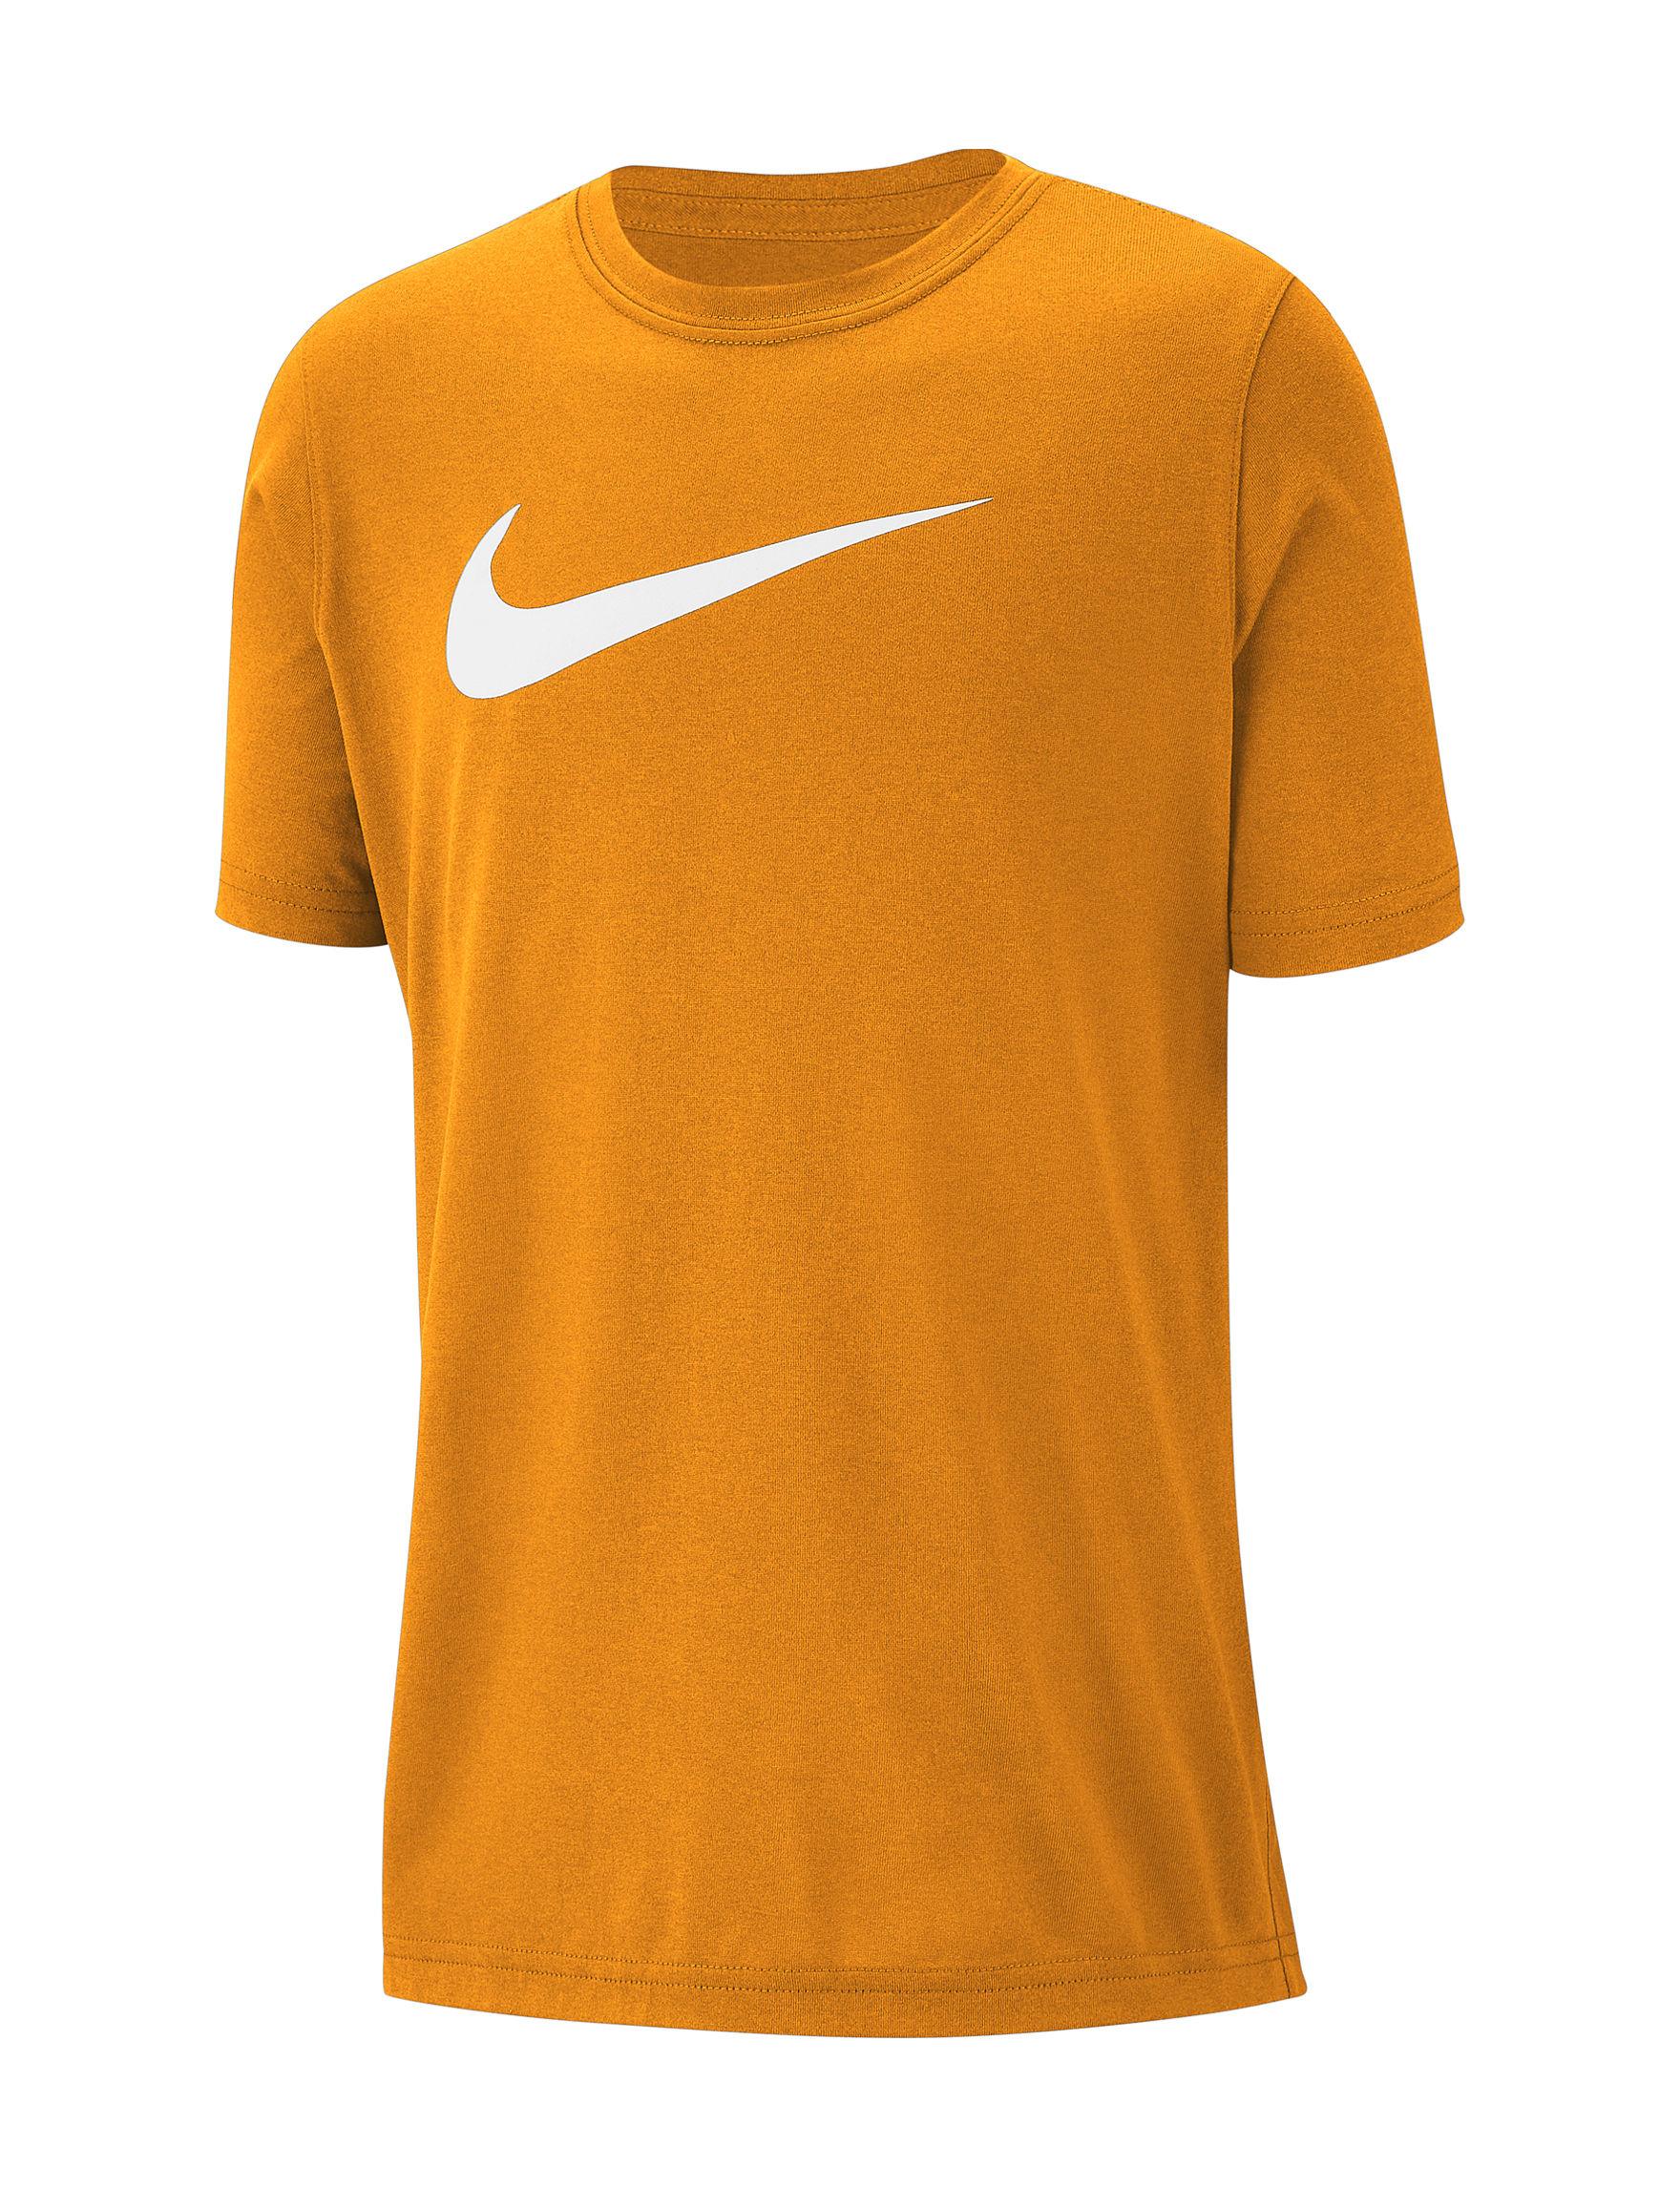 Nike Orange Tees & Tanks